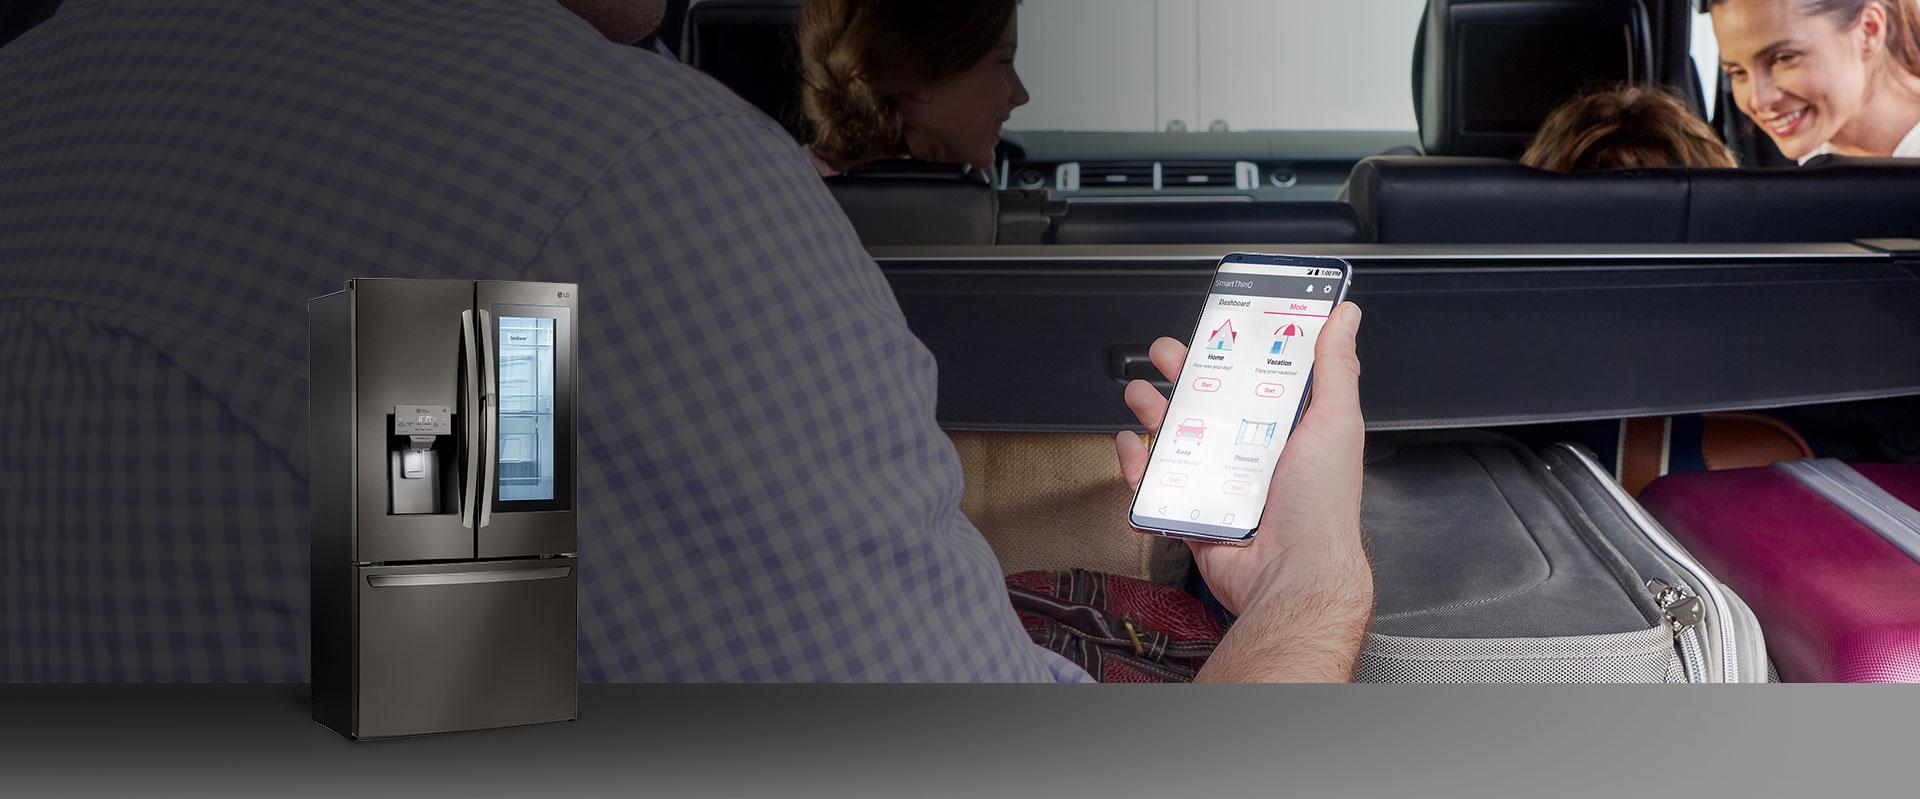 LG SmartThinQ Kitchen: Smart Refrigerators, Ranges, & Dishwashers